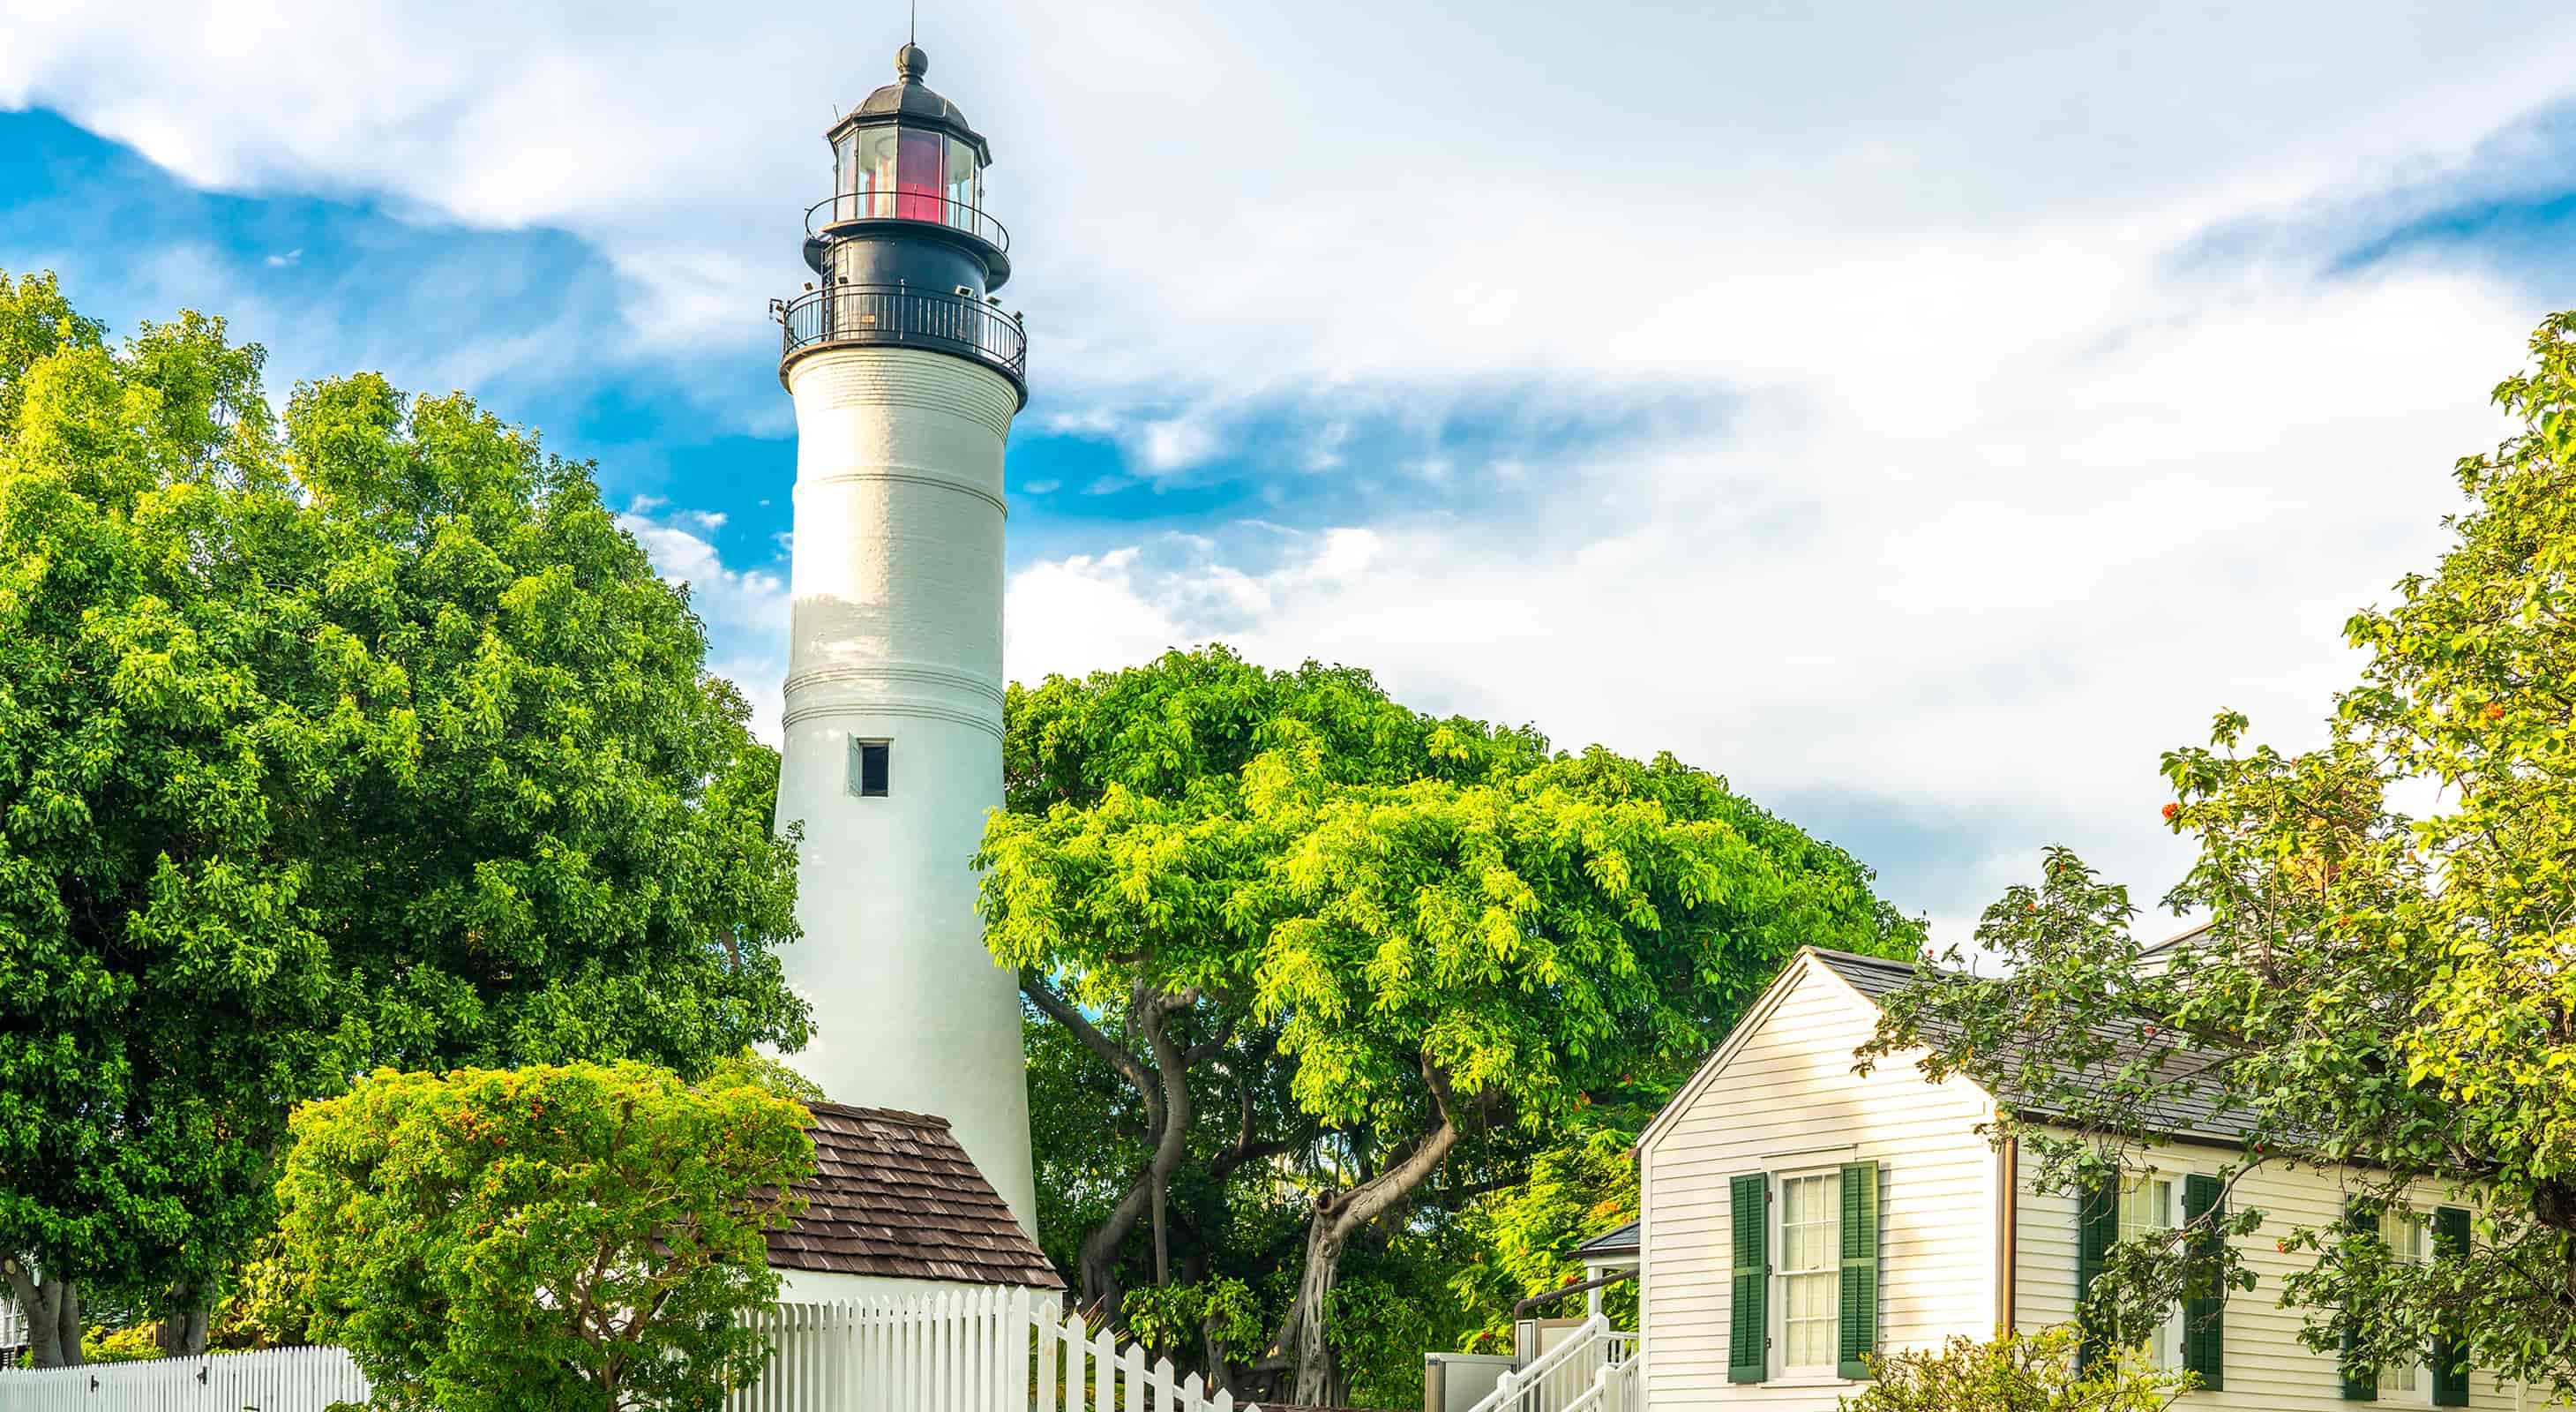 Lighthouse in Key West, FL